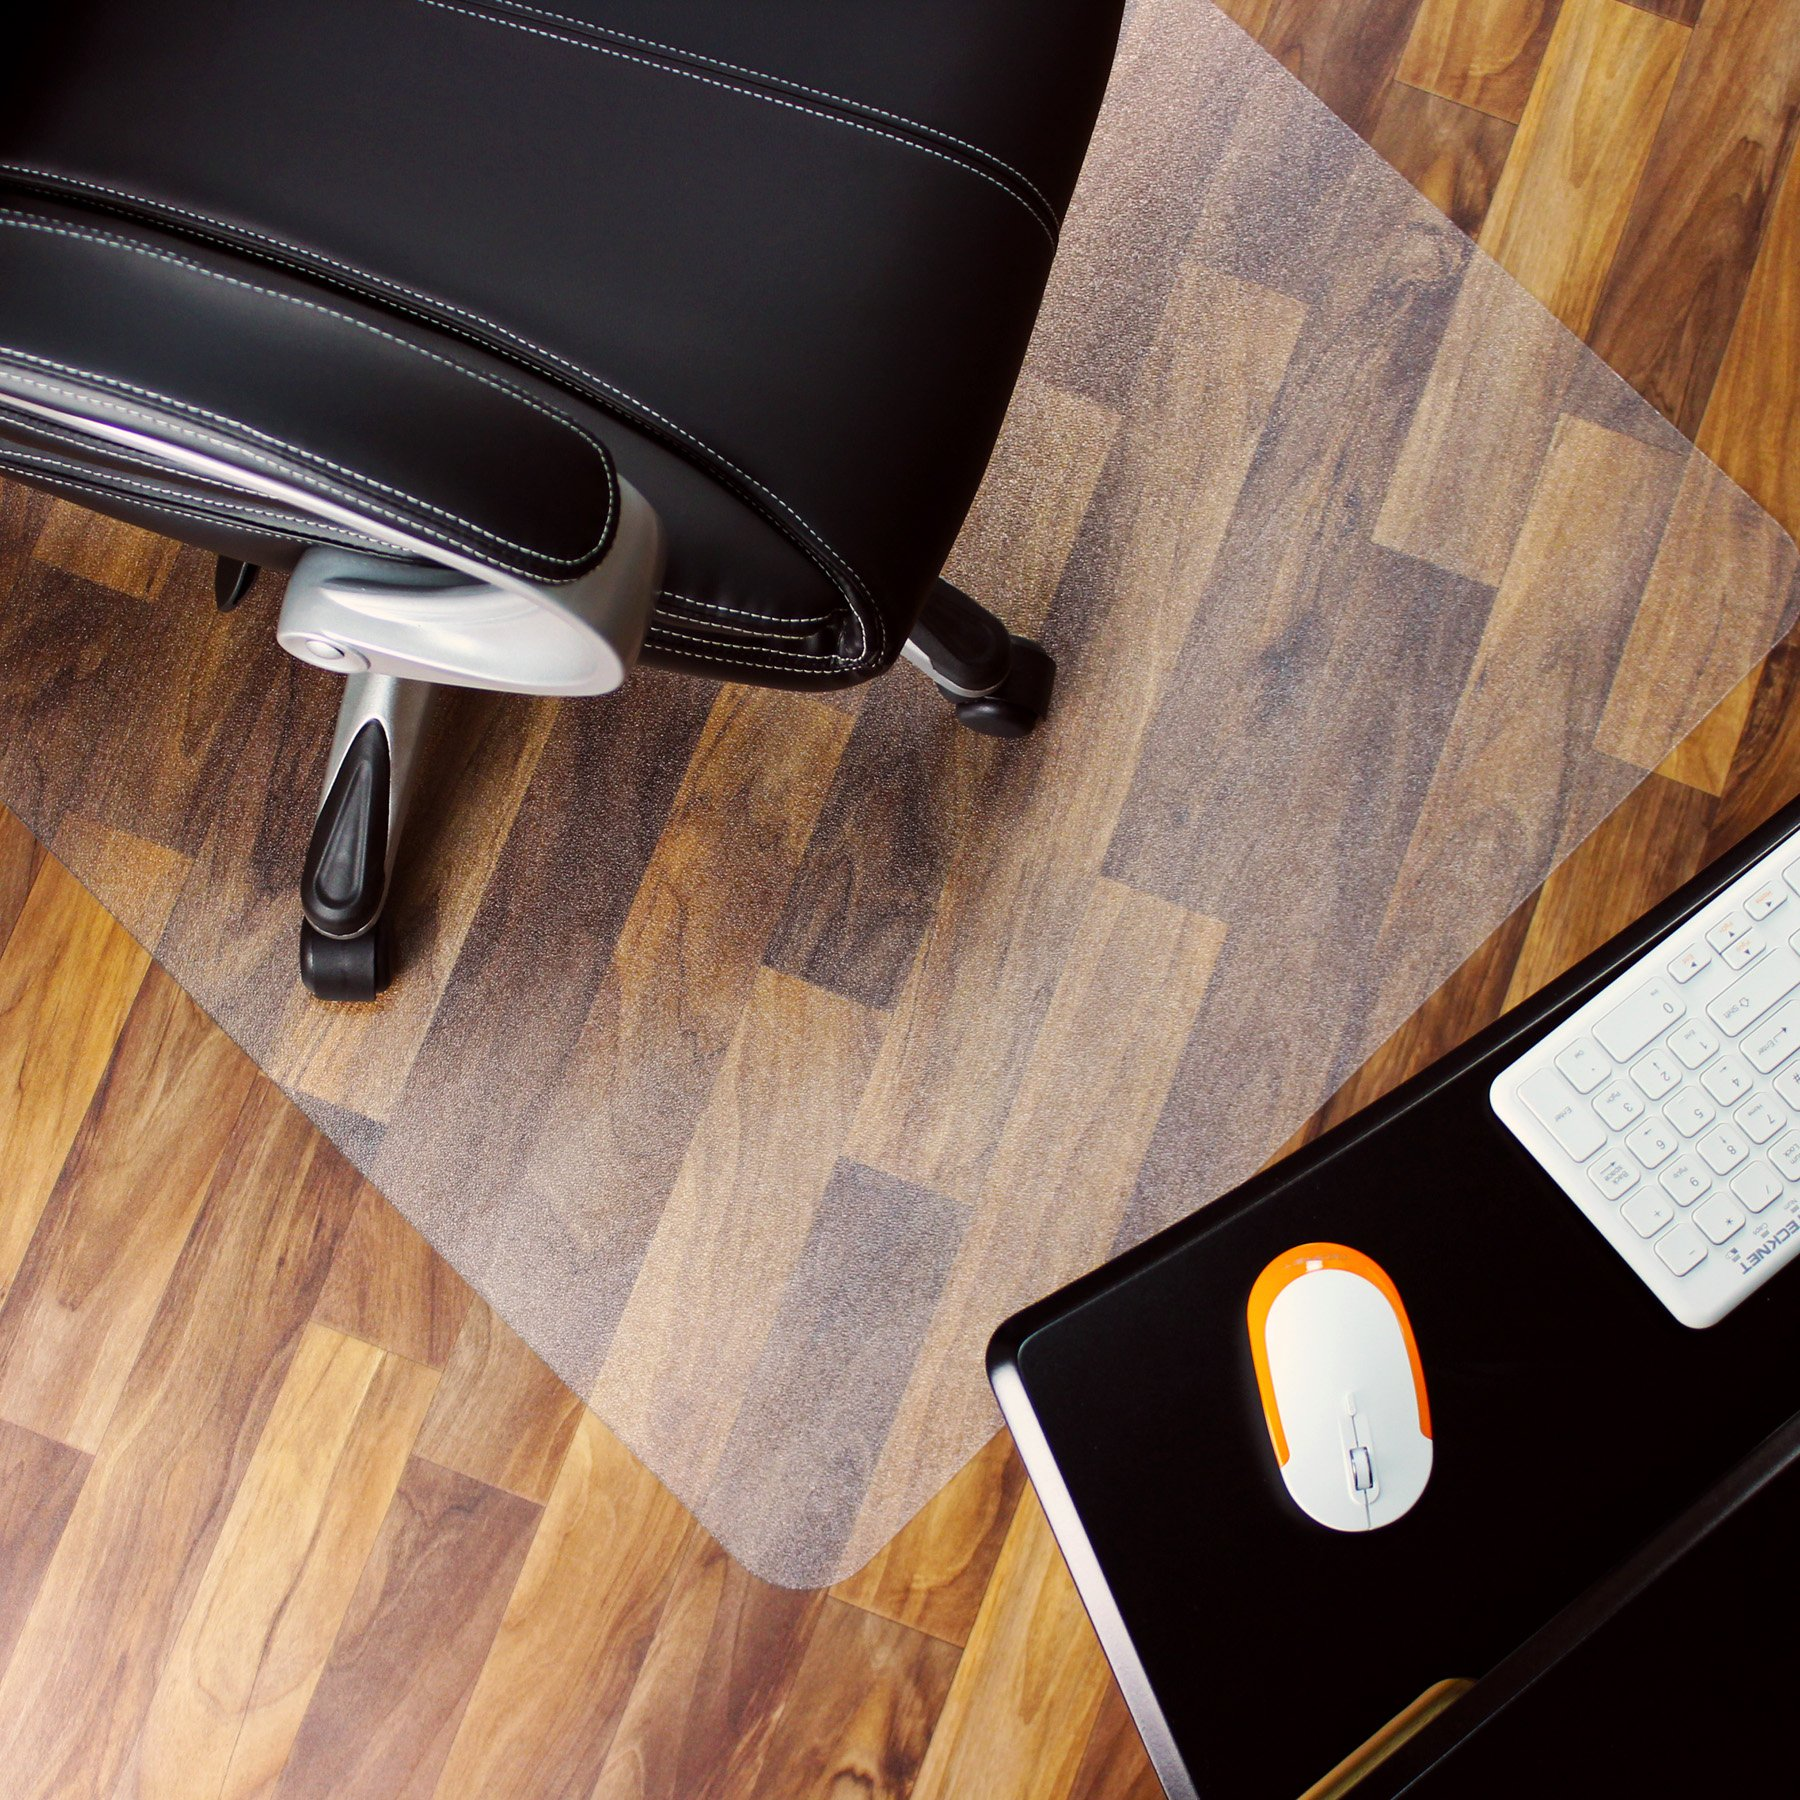 Marvelux 48'' x 60'' Heavy Duty Polycarbonate (PC) Rectangular Chair Mat for Hard Floors | Transparent Hardwood Floor Protector | Multiple Sizes